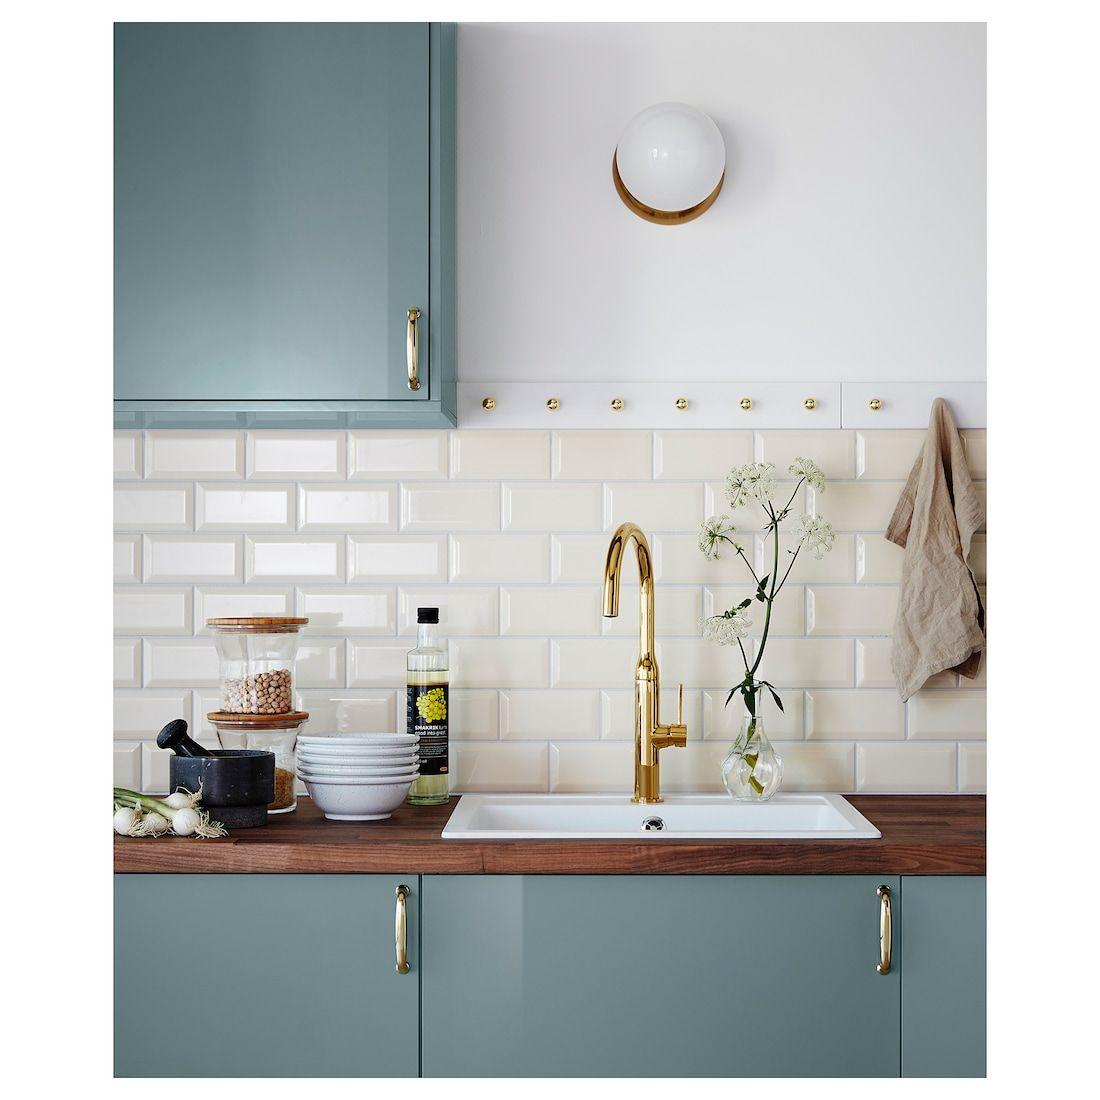 Karlby Countertop Walnut Veneer 98x1 1 2 249x3 8 Cm In 2020 Ikea Kitchen Ikea Kitchen Cabinets Karlby Countertop